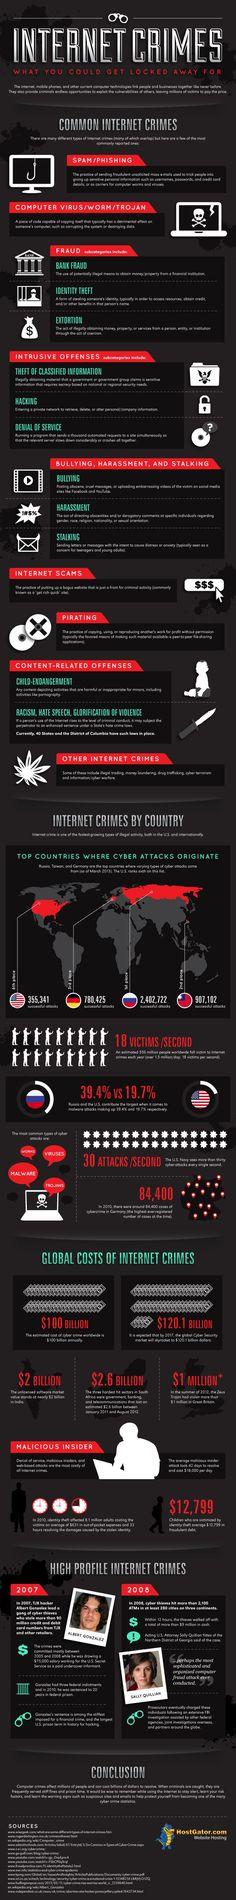 (3) Cyber Crime Around the World - iNFOGRAPHiCs MANiA